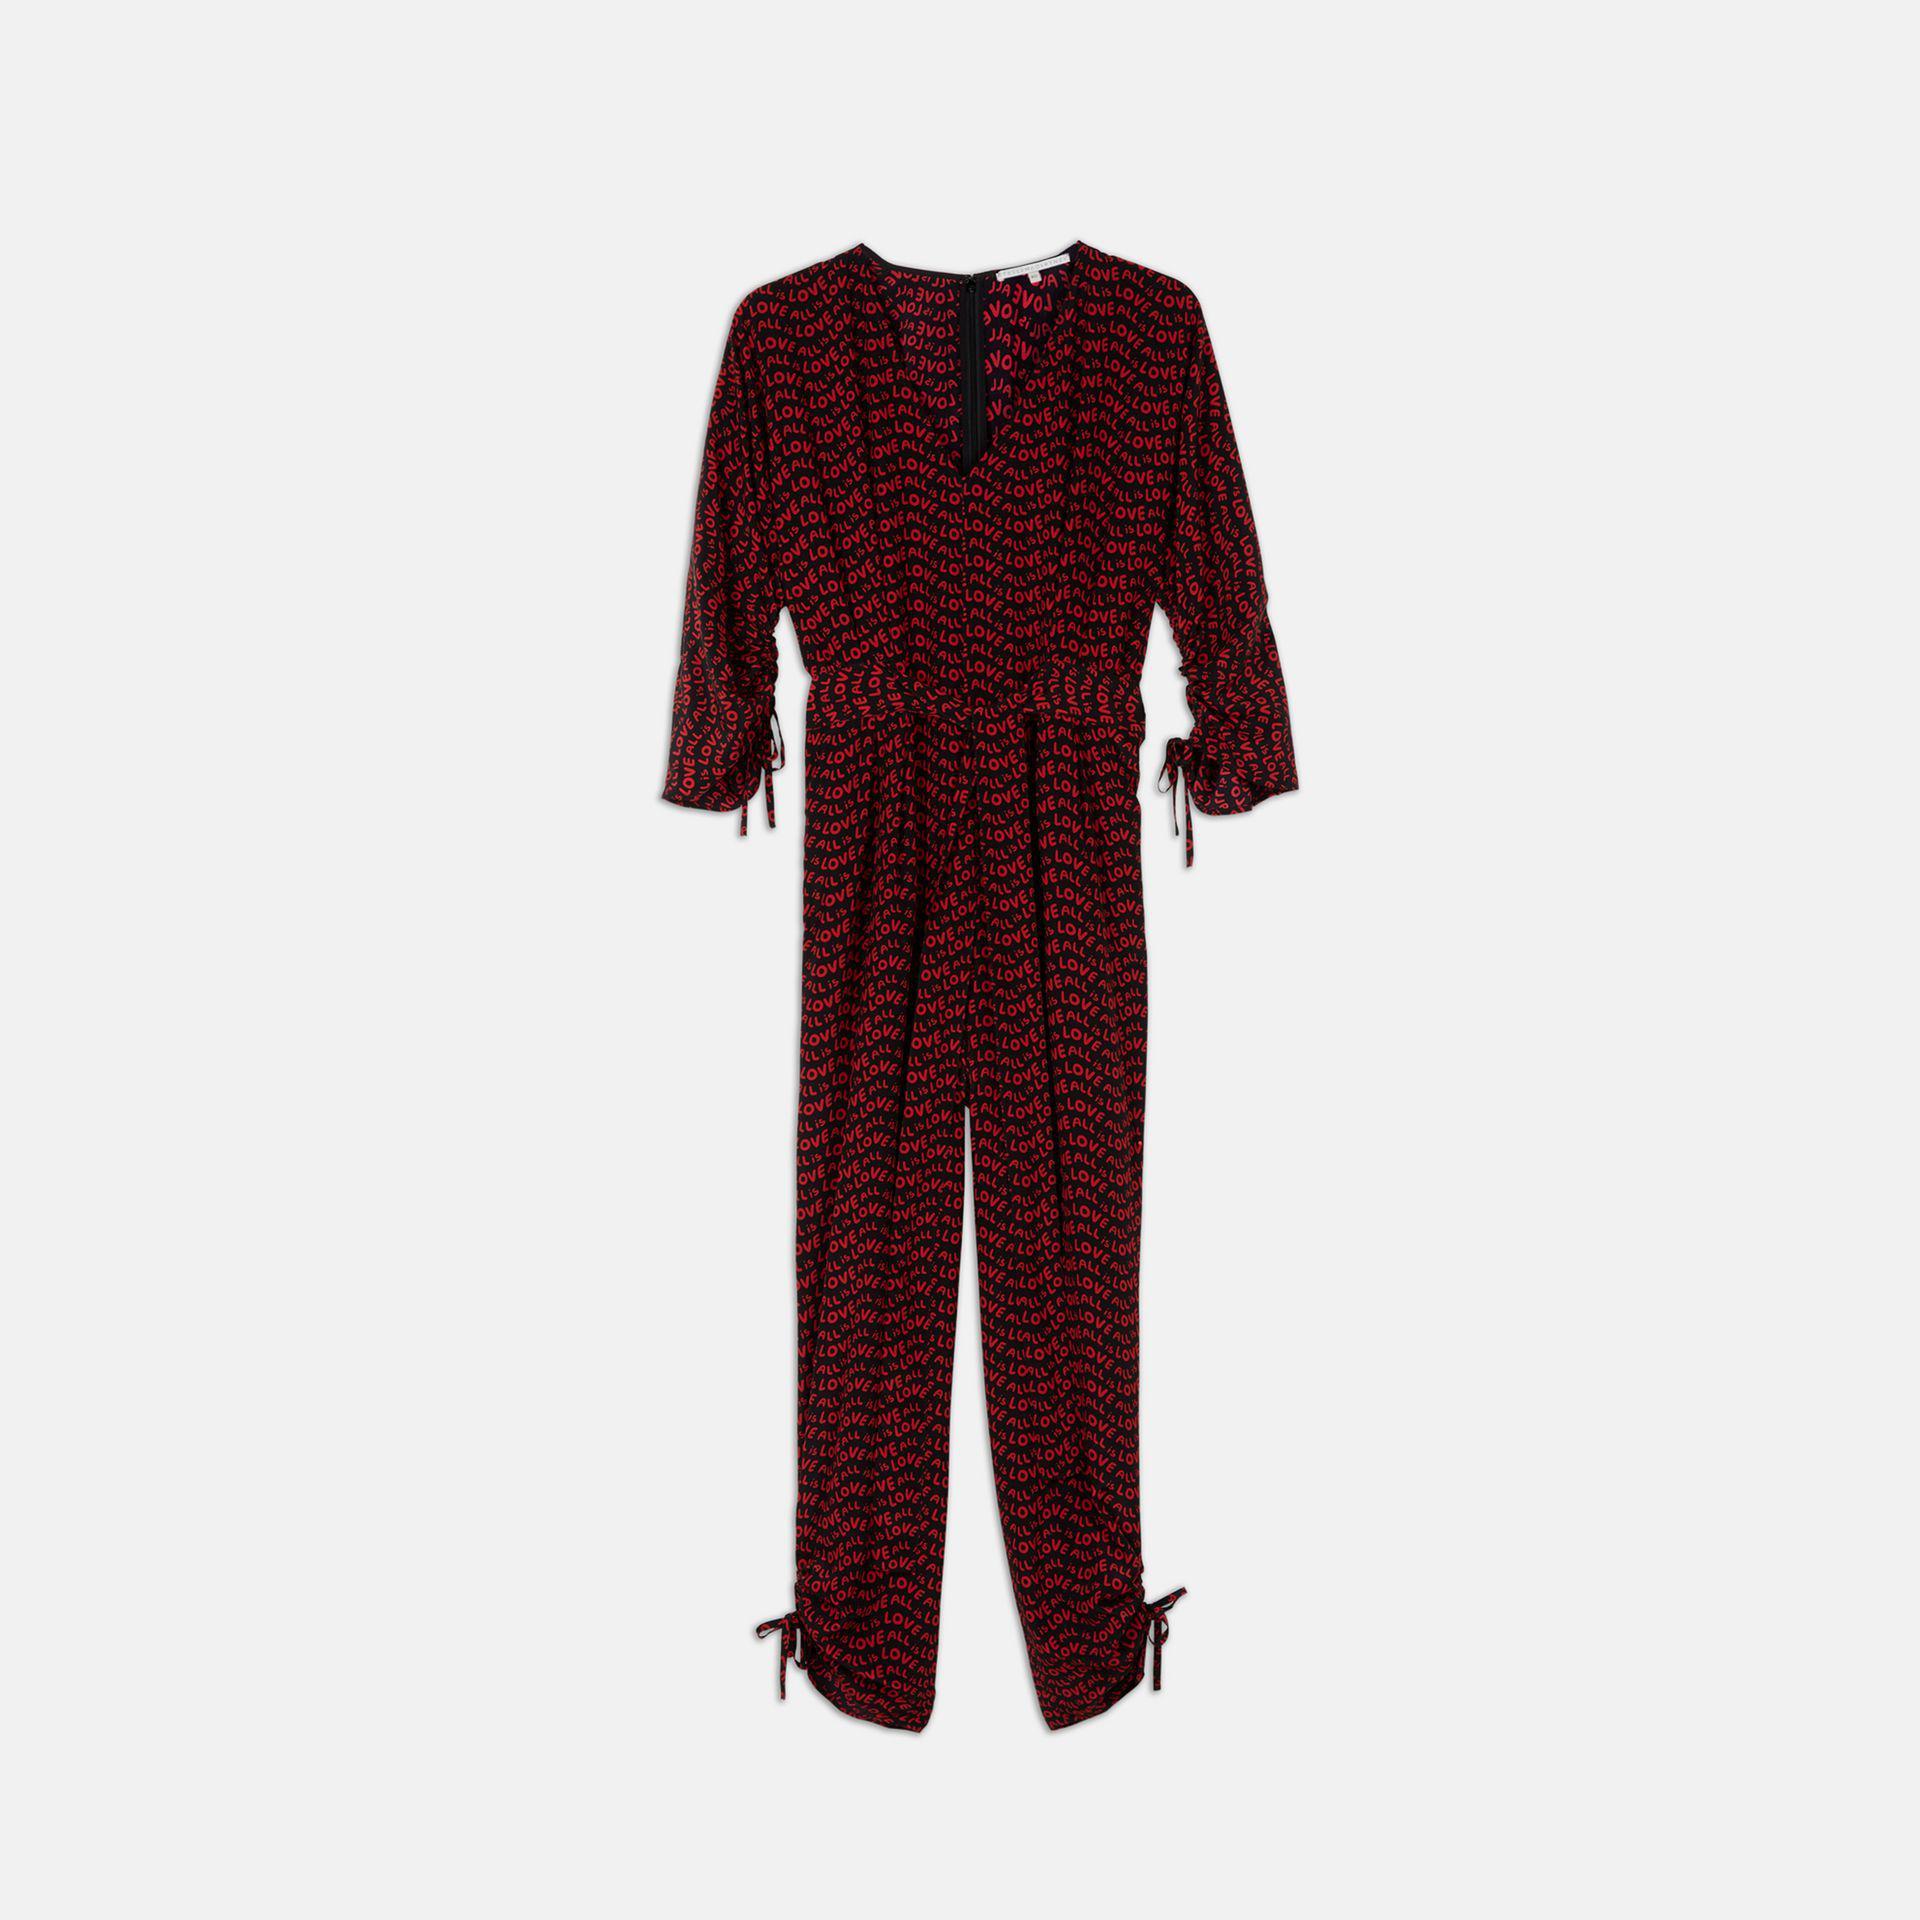 960488f35a7 Lyst - Stella McCartney All Is Love Silk Jumpsuit in Black